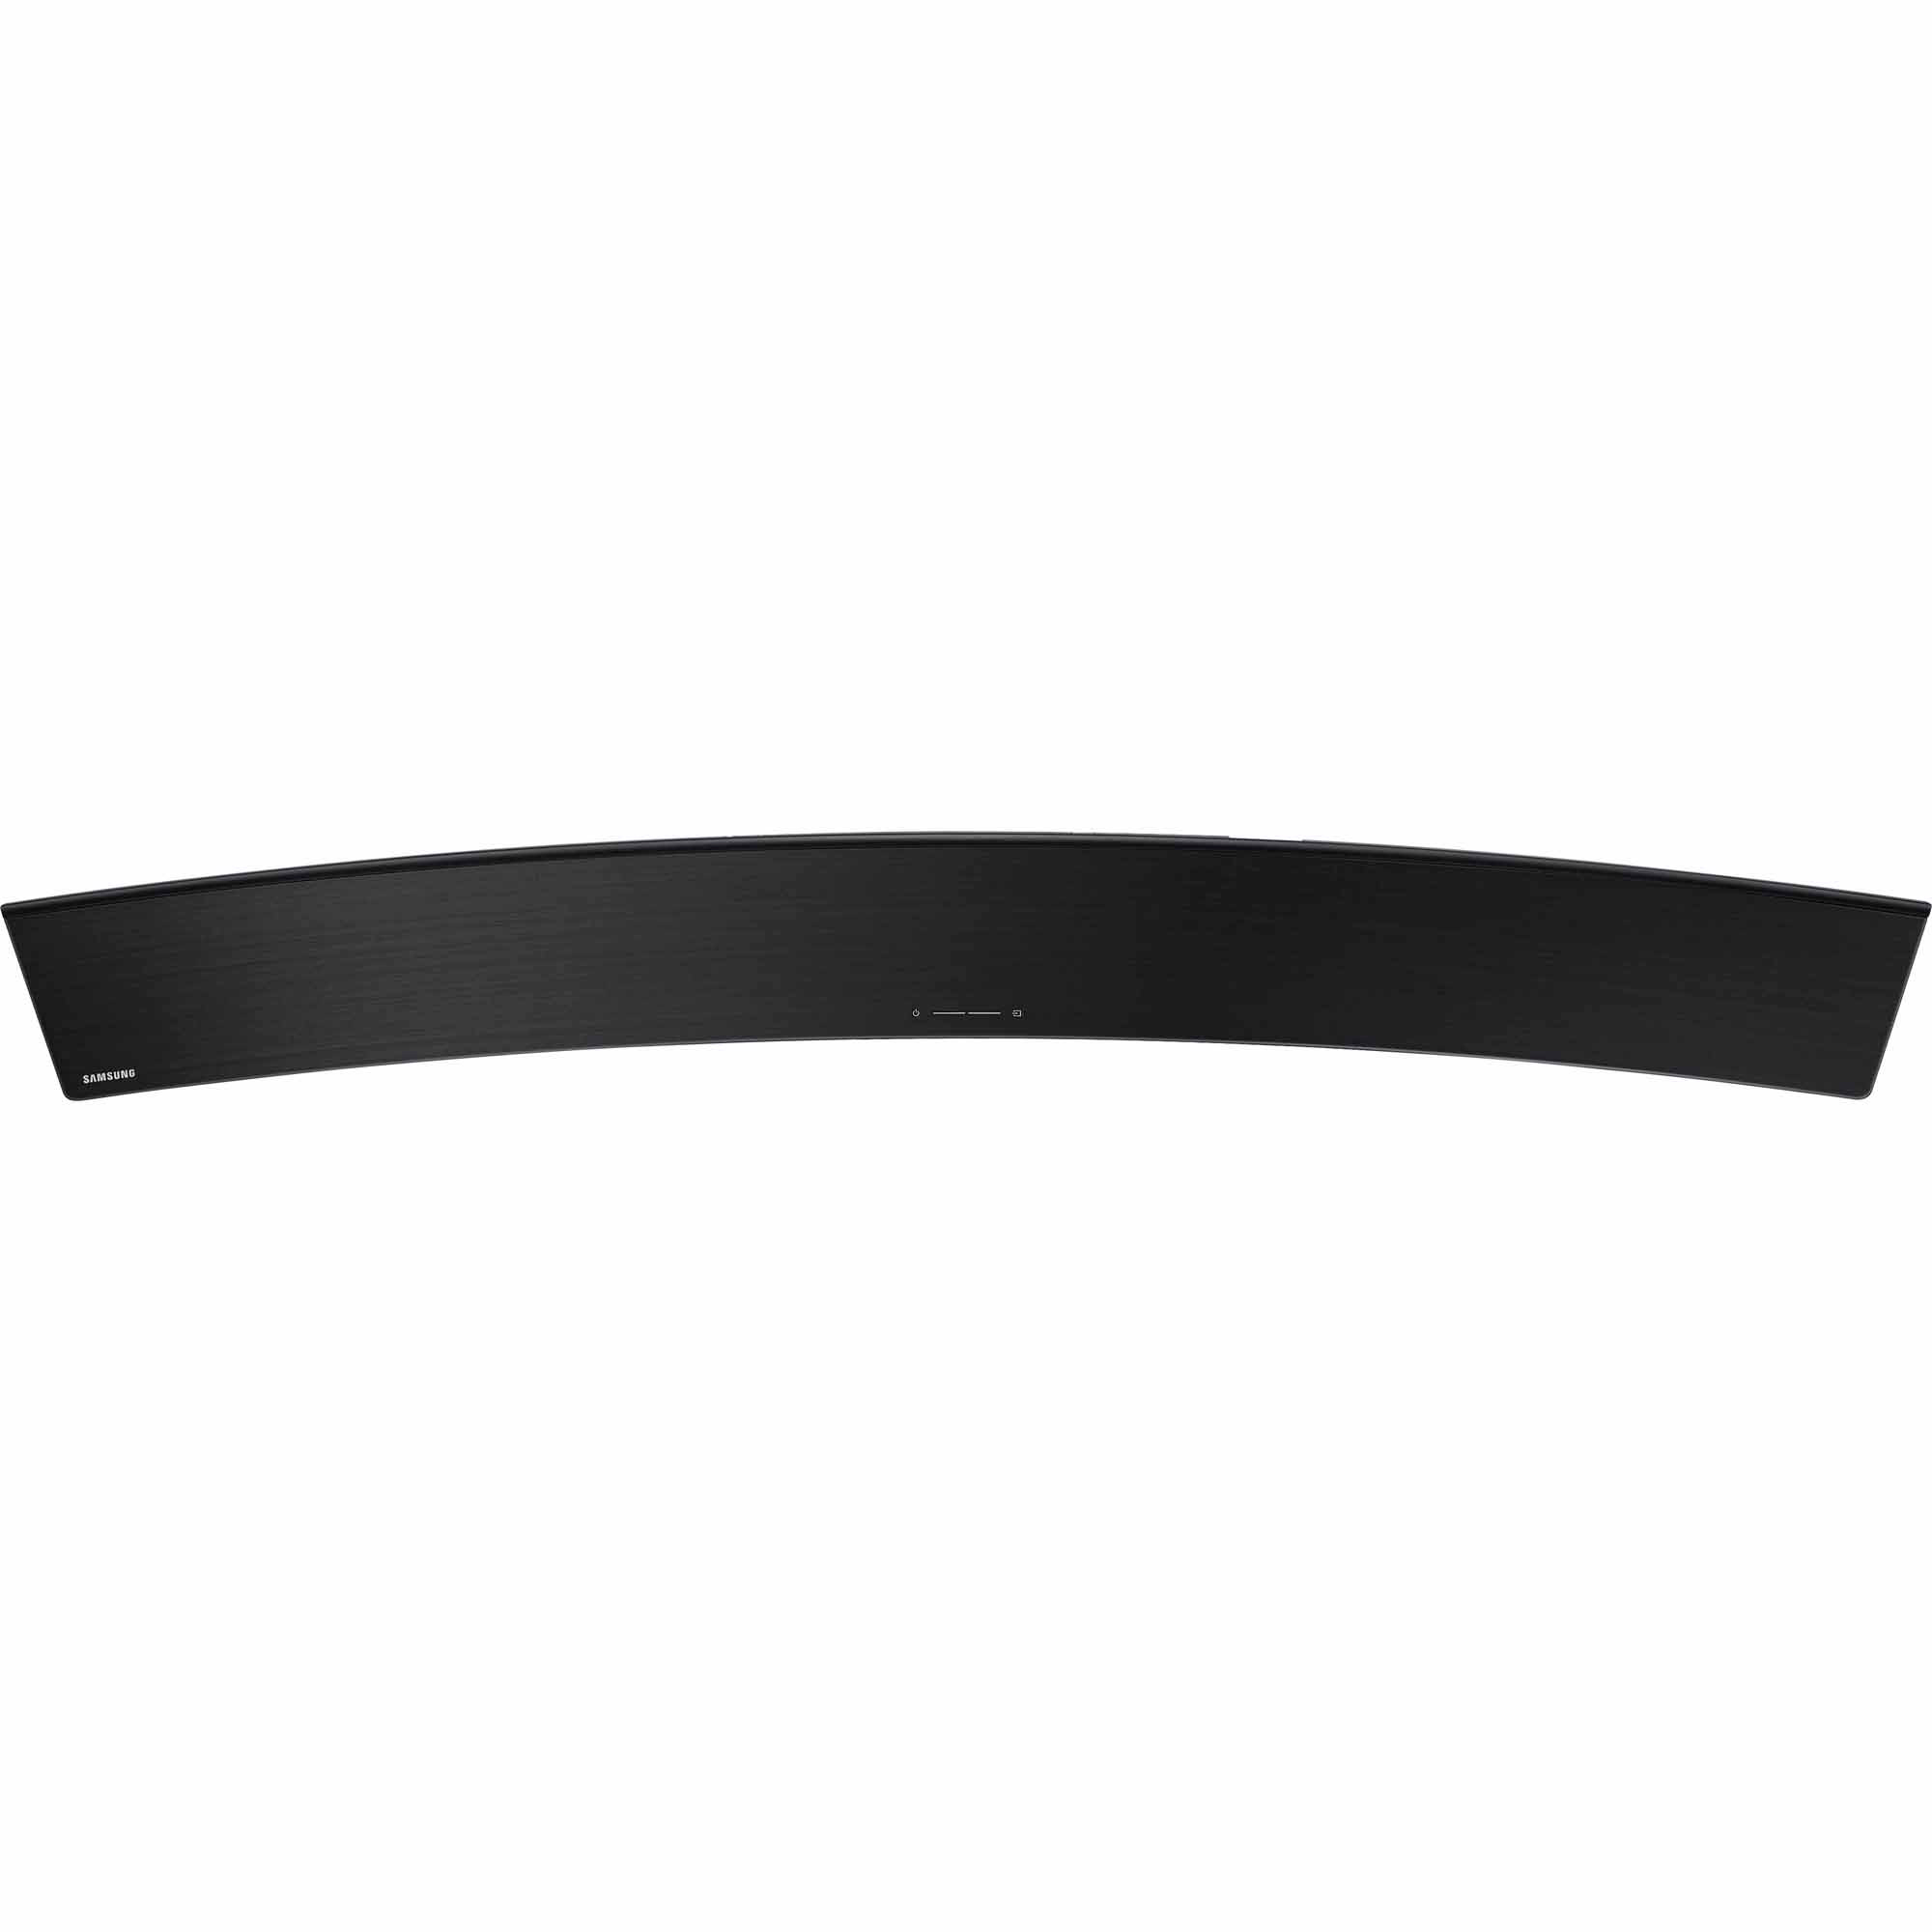 Samsung 8.1-Channel 320W Curved Soundbar w/ Wireless Subwoofer - HW-J7500